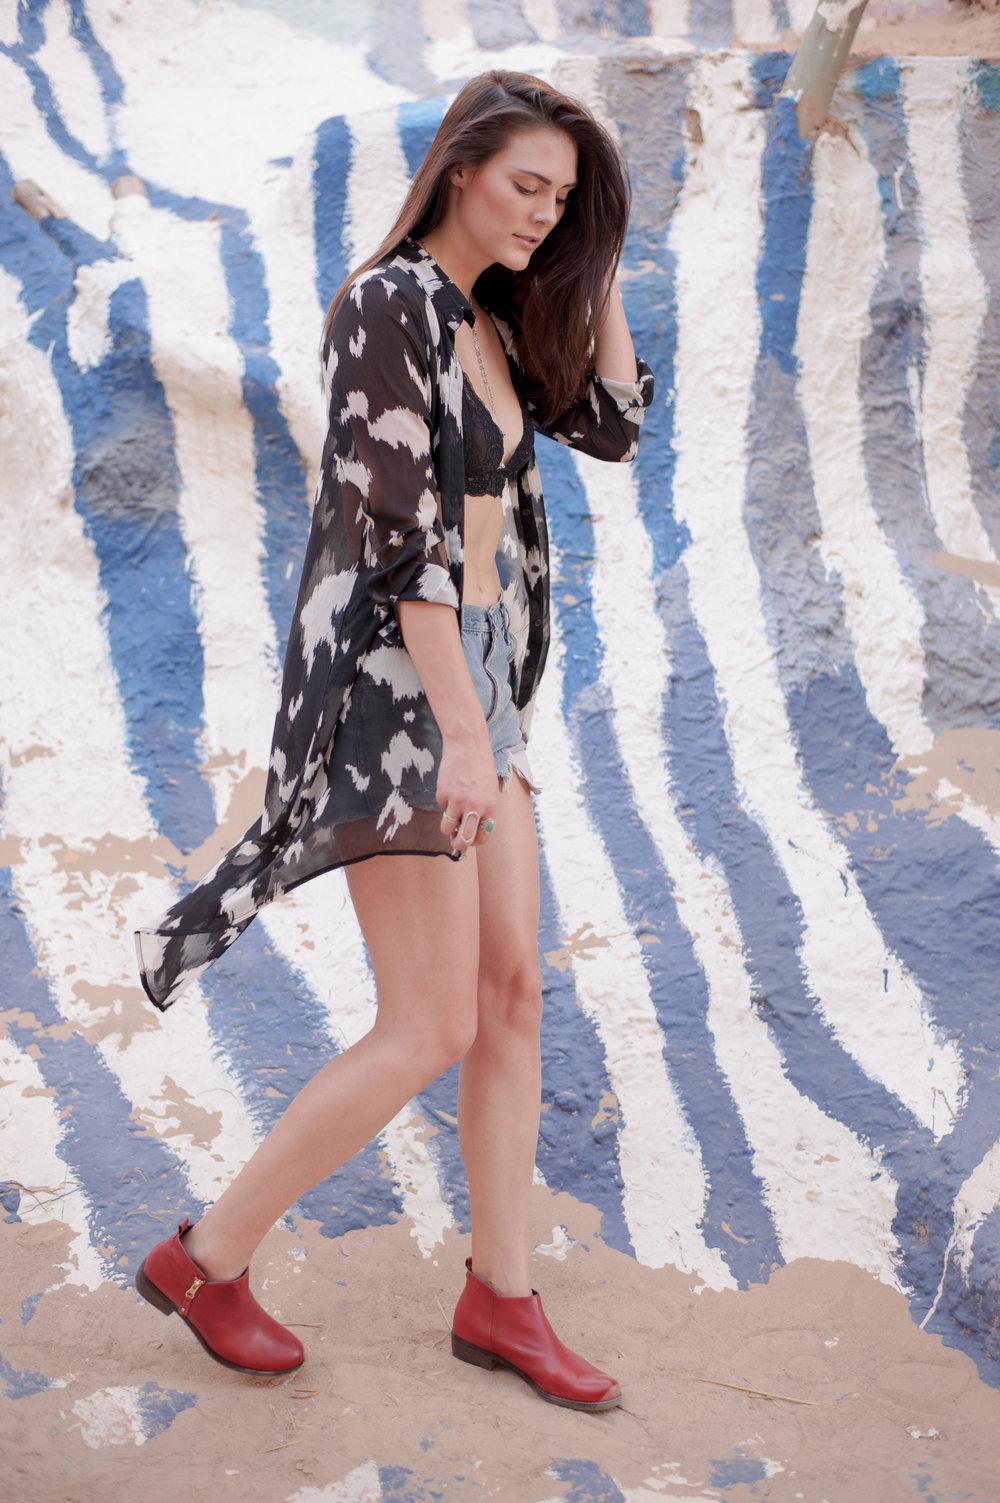 Kimono: Hobo Jane Boutique